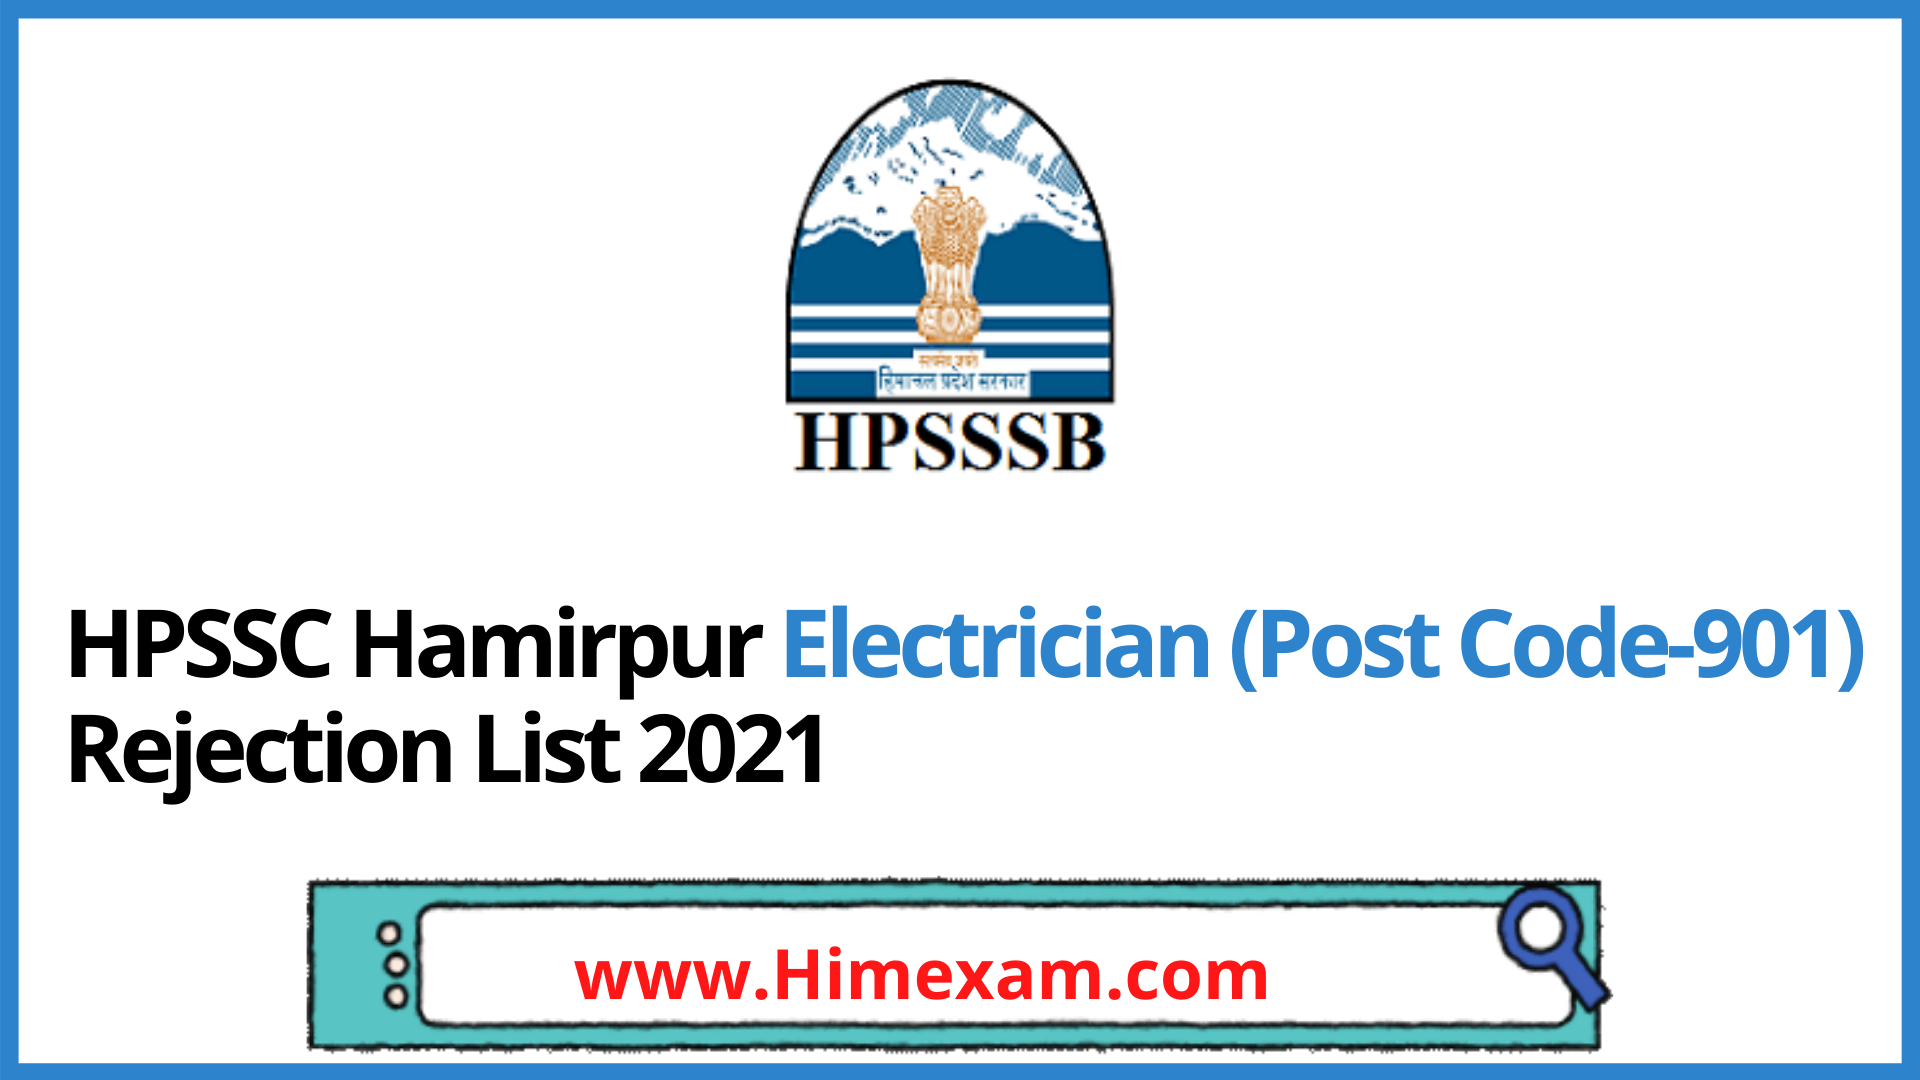 HPSSC Hamirpur Electrician (Post Code-901) Rejection List 2021